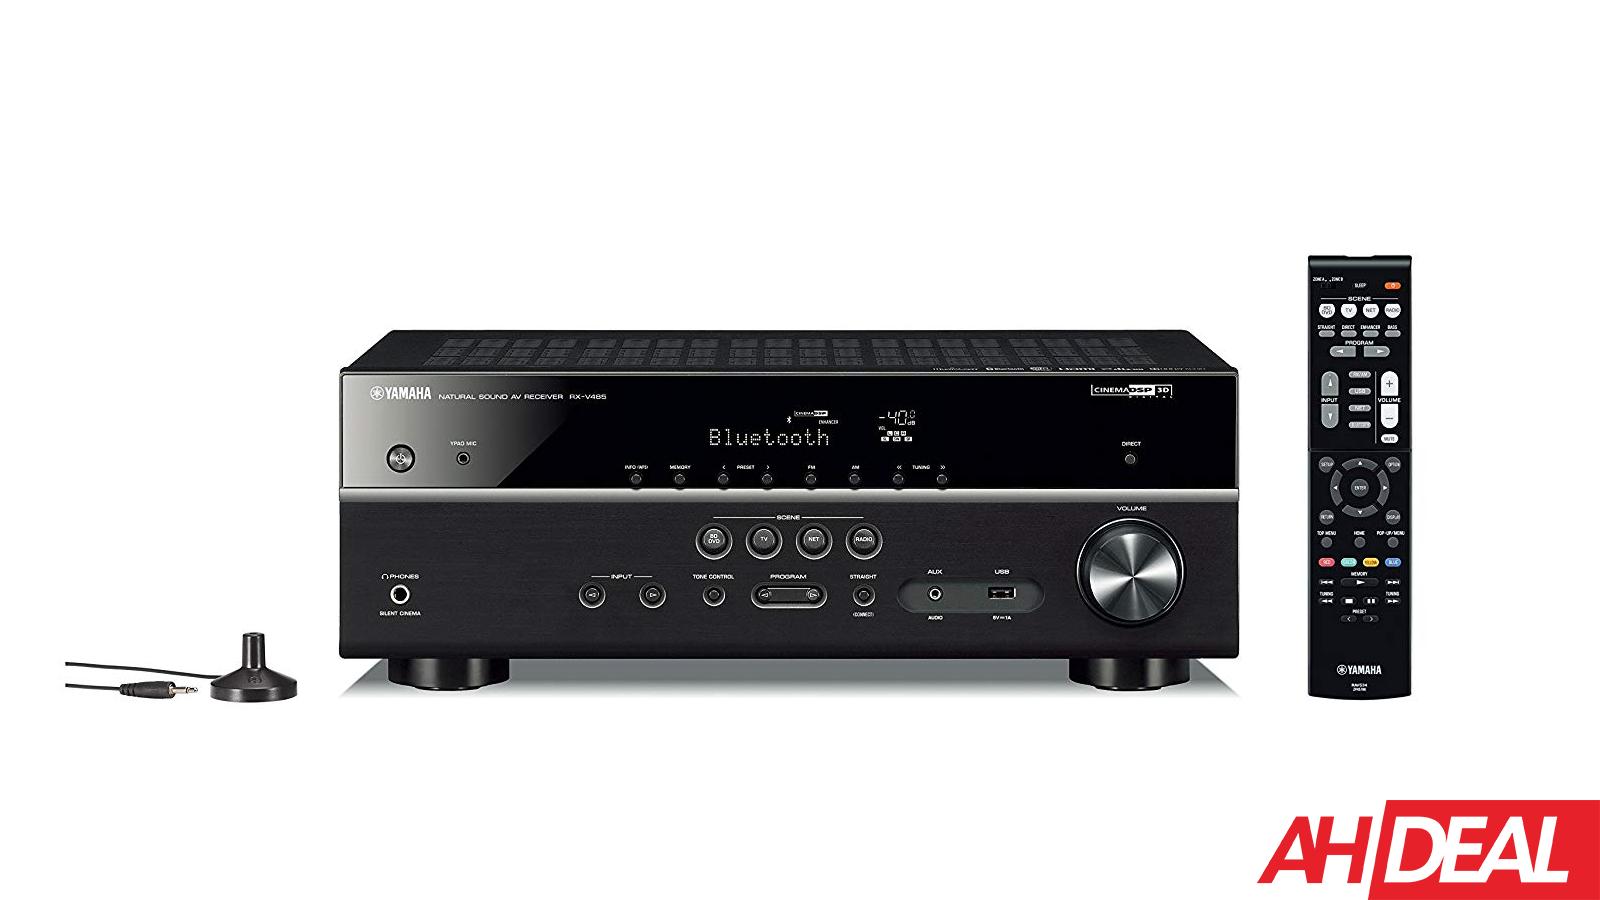 Yamaha TSR-5830 7.2-Channel 4K Dolby Atmos AV Receiver $229 – Amazon Holiday Deals 2018